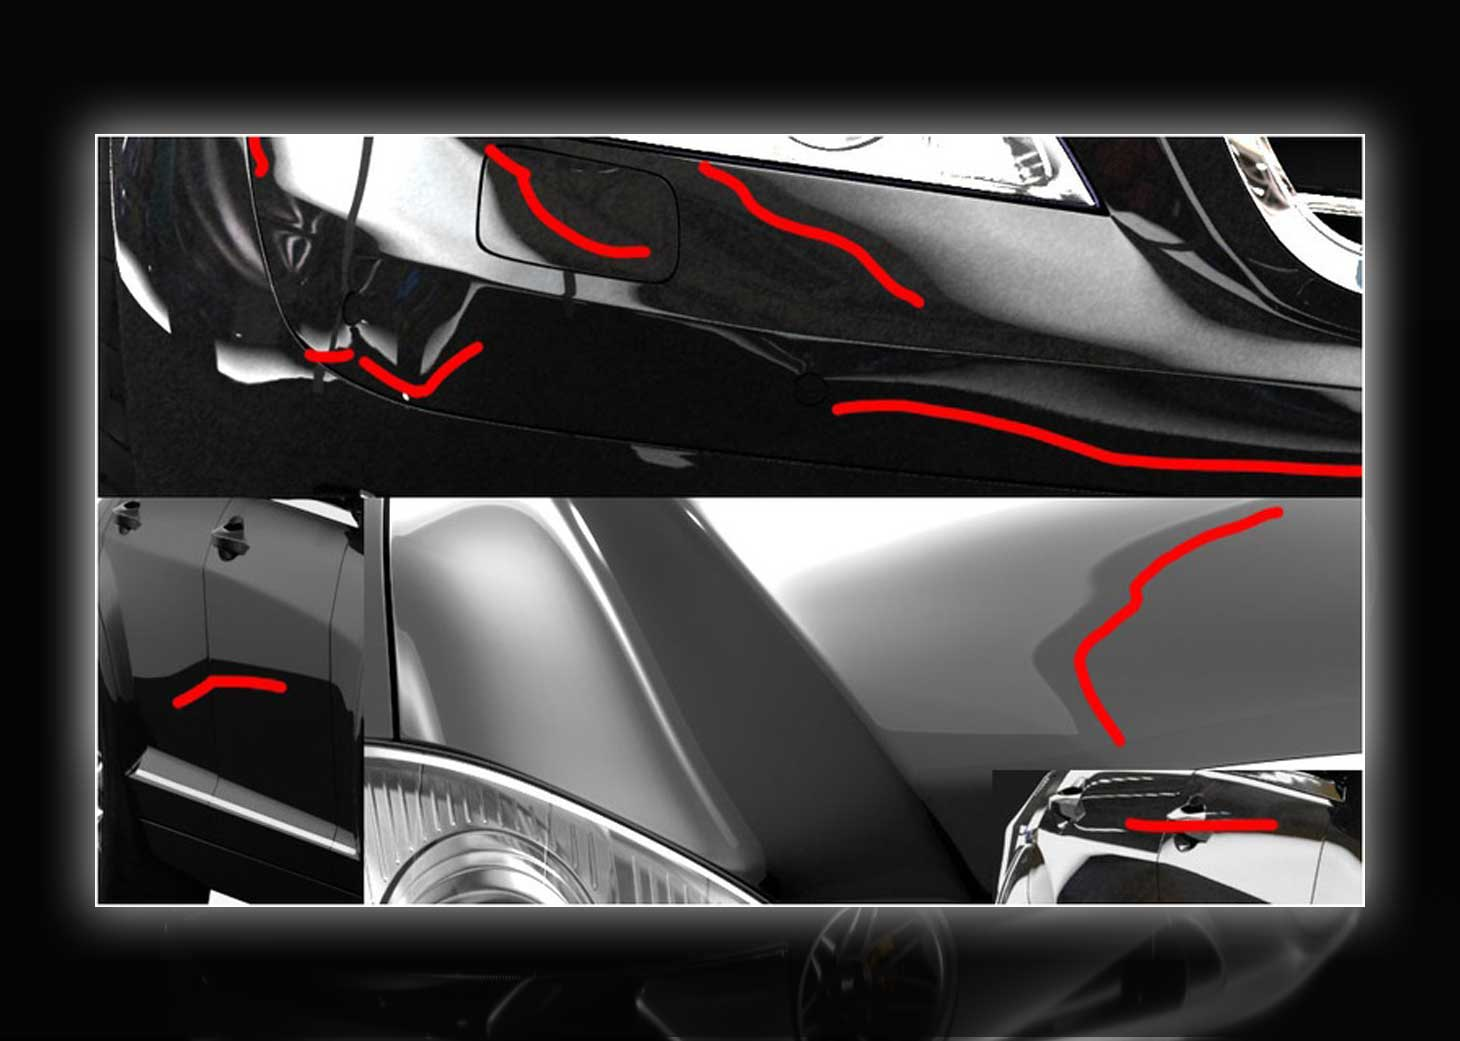 modeling using polygons car 3ds max maya11pg - مدلسازی خودرو در تری دی مکس